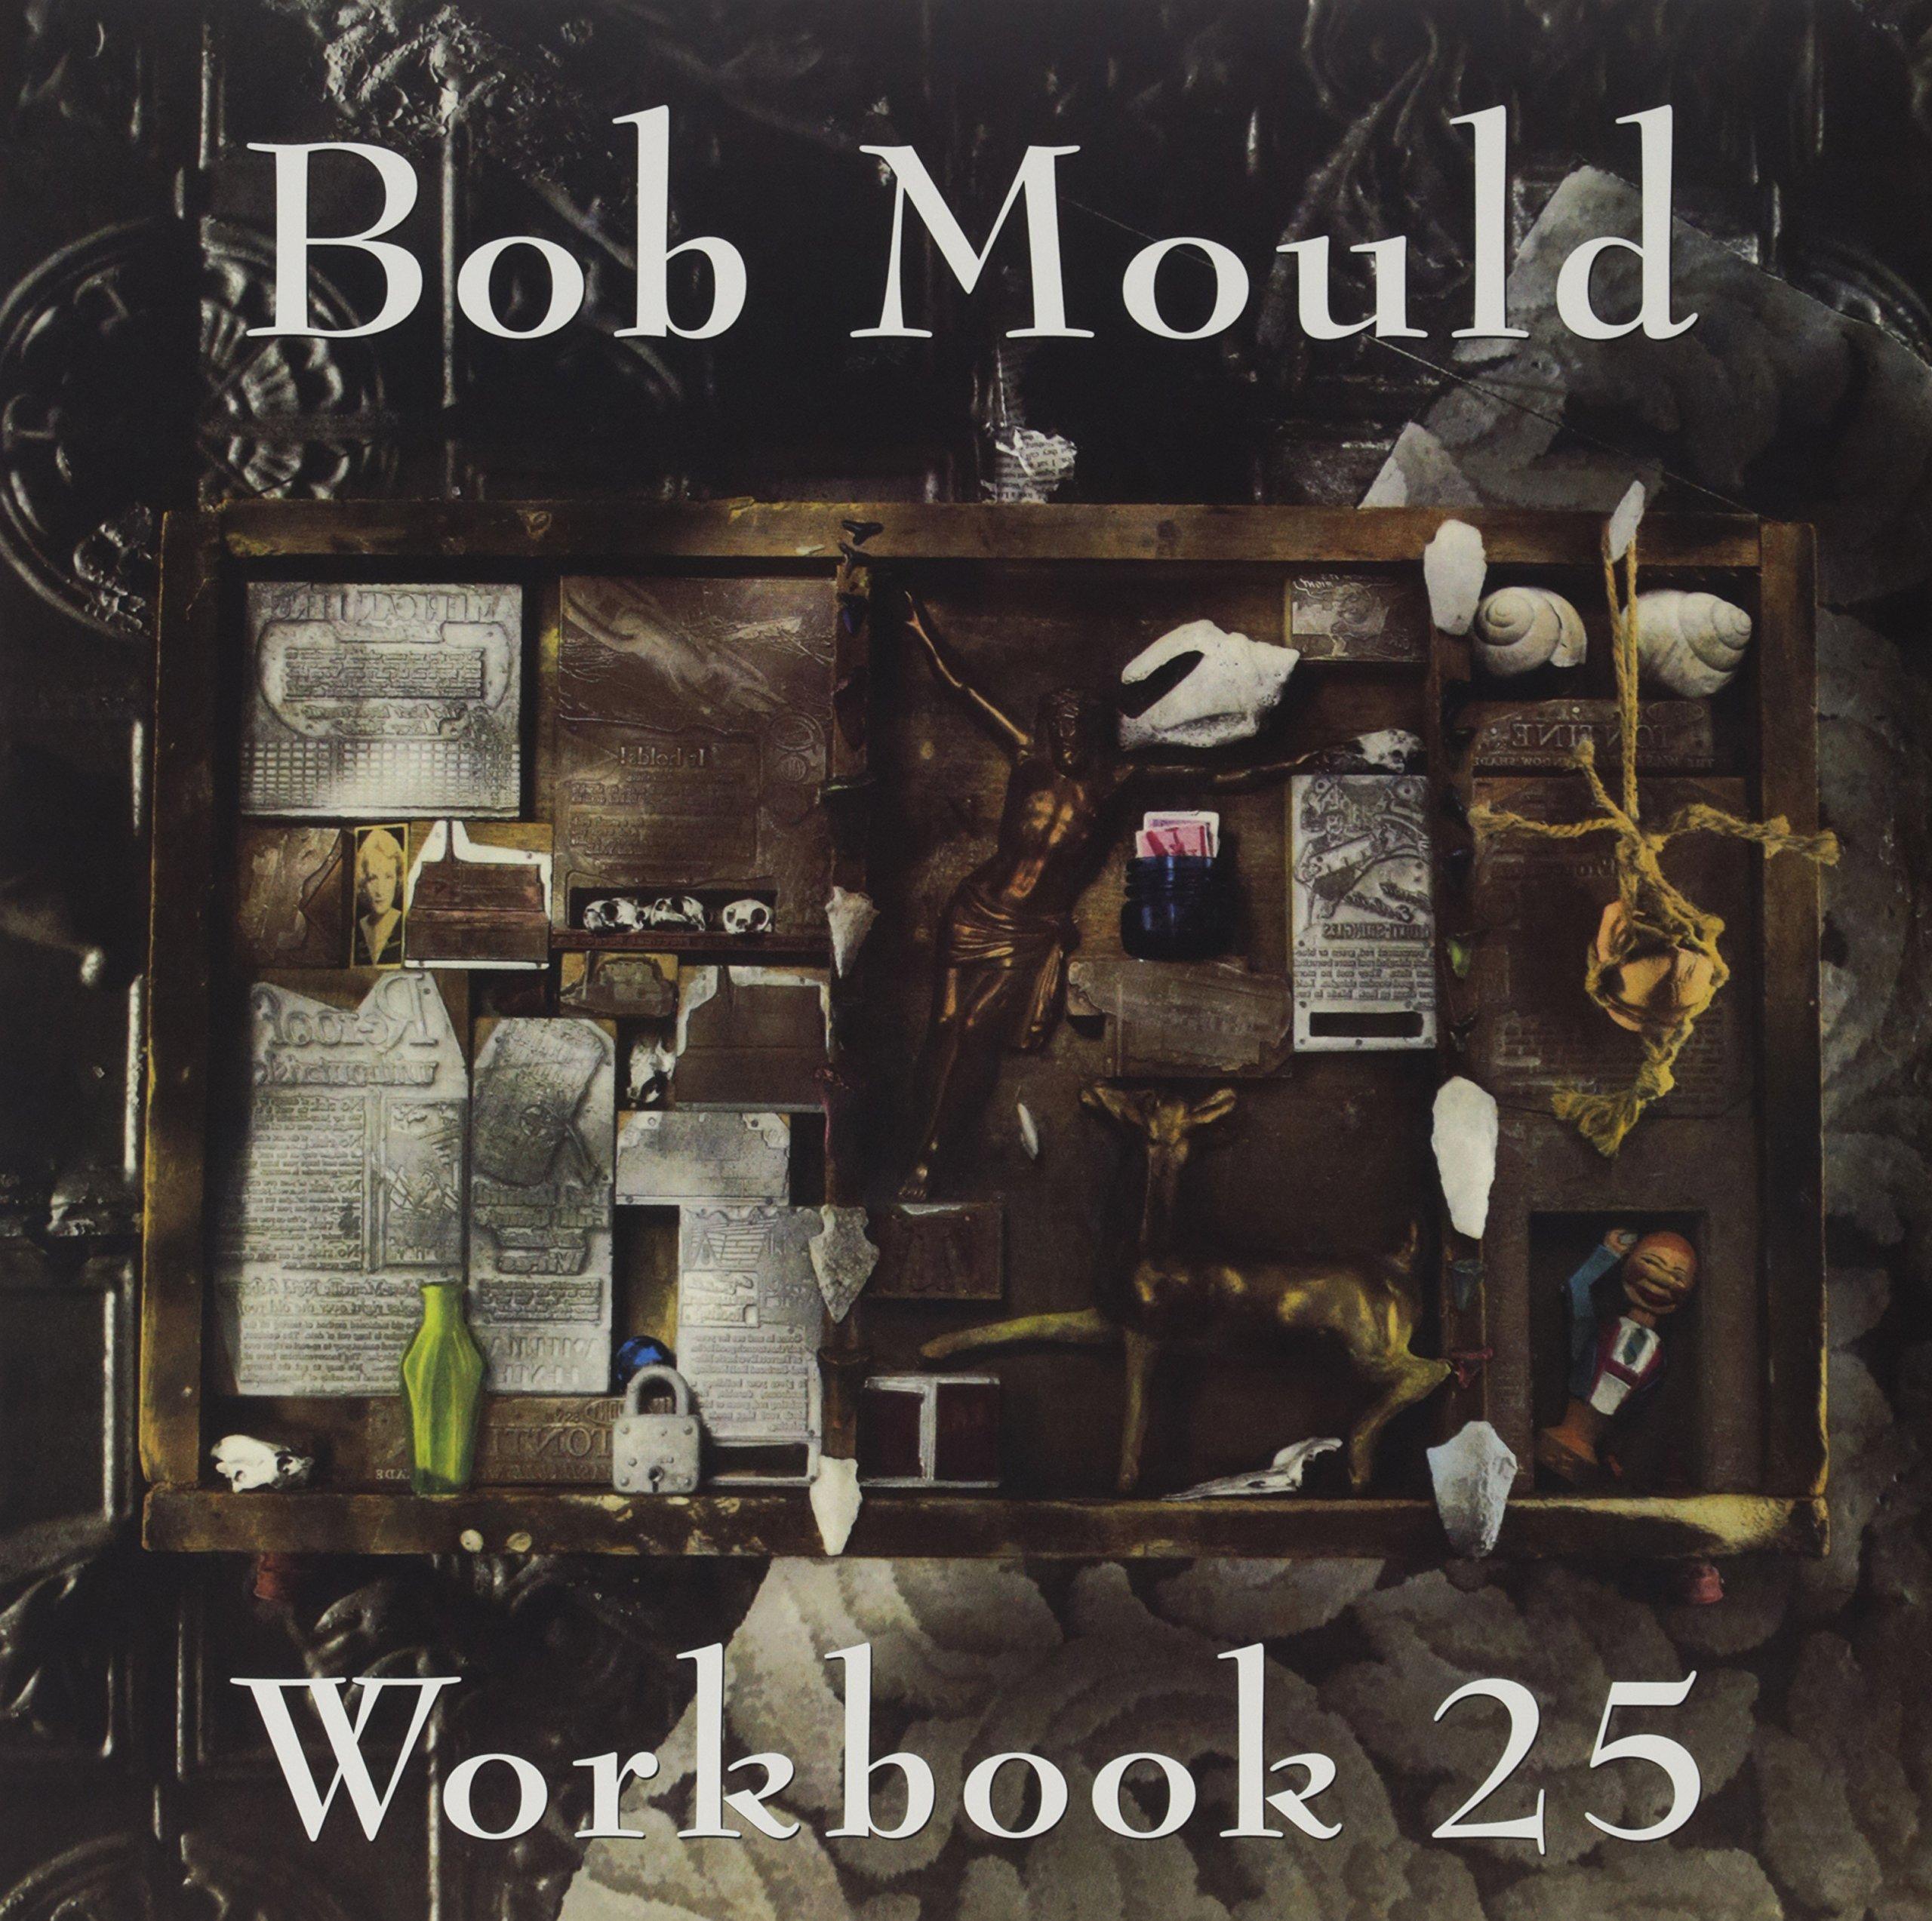 Workbook 25